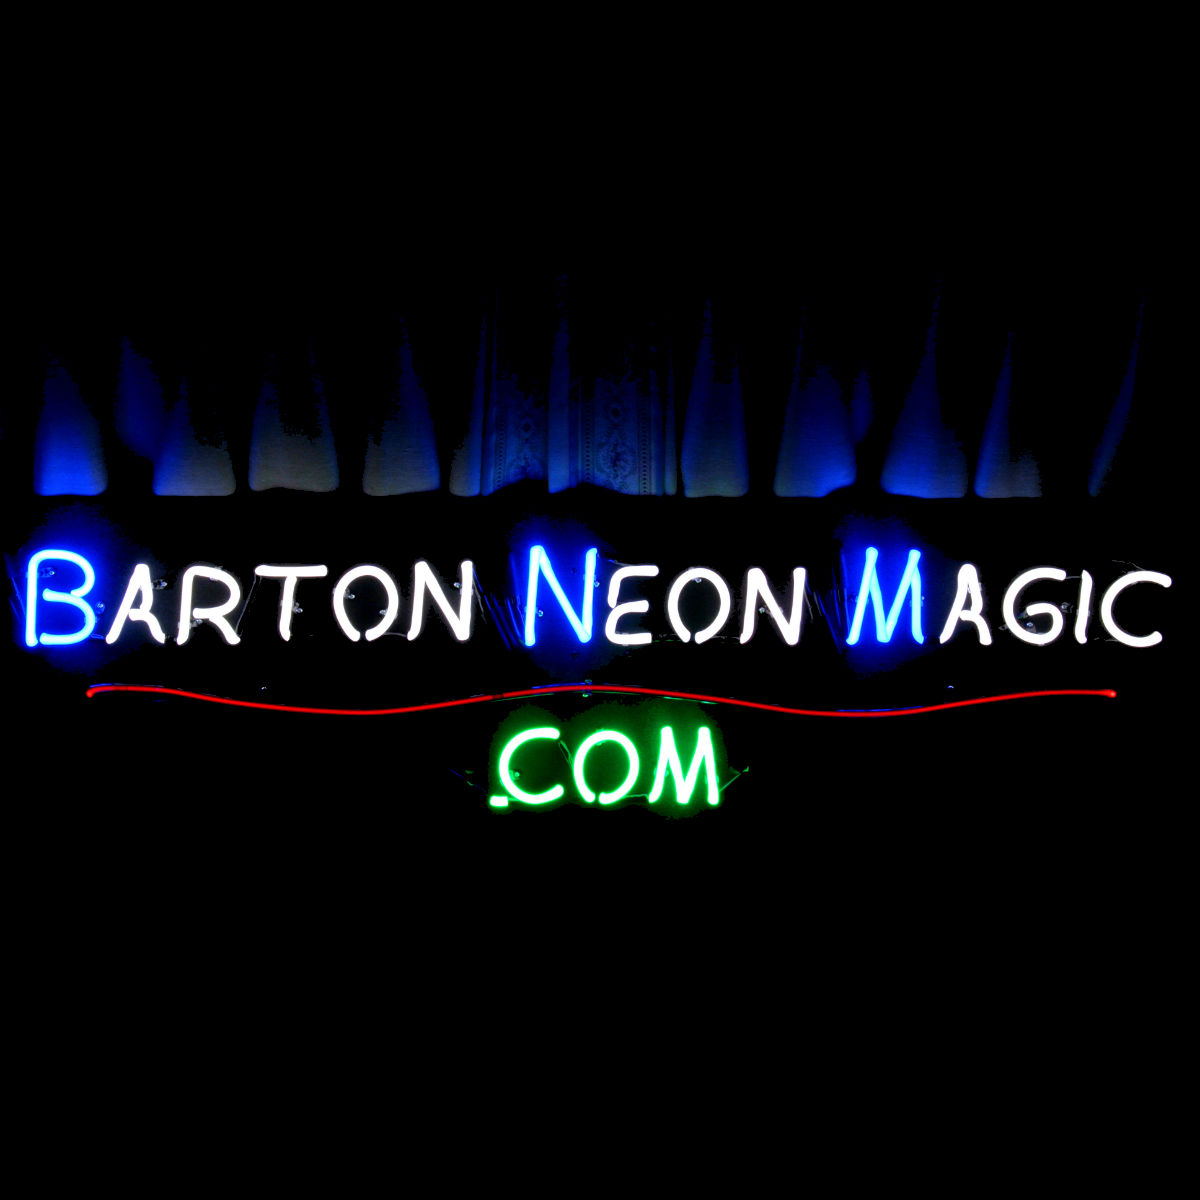 Custom automotive neon signs by John Barton - Famous USA Neon Glass Artist - BartonNeonMagic.com